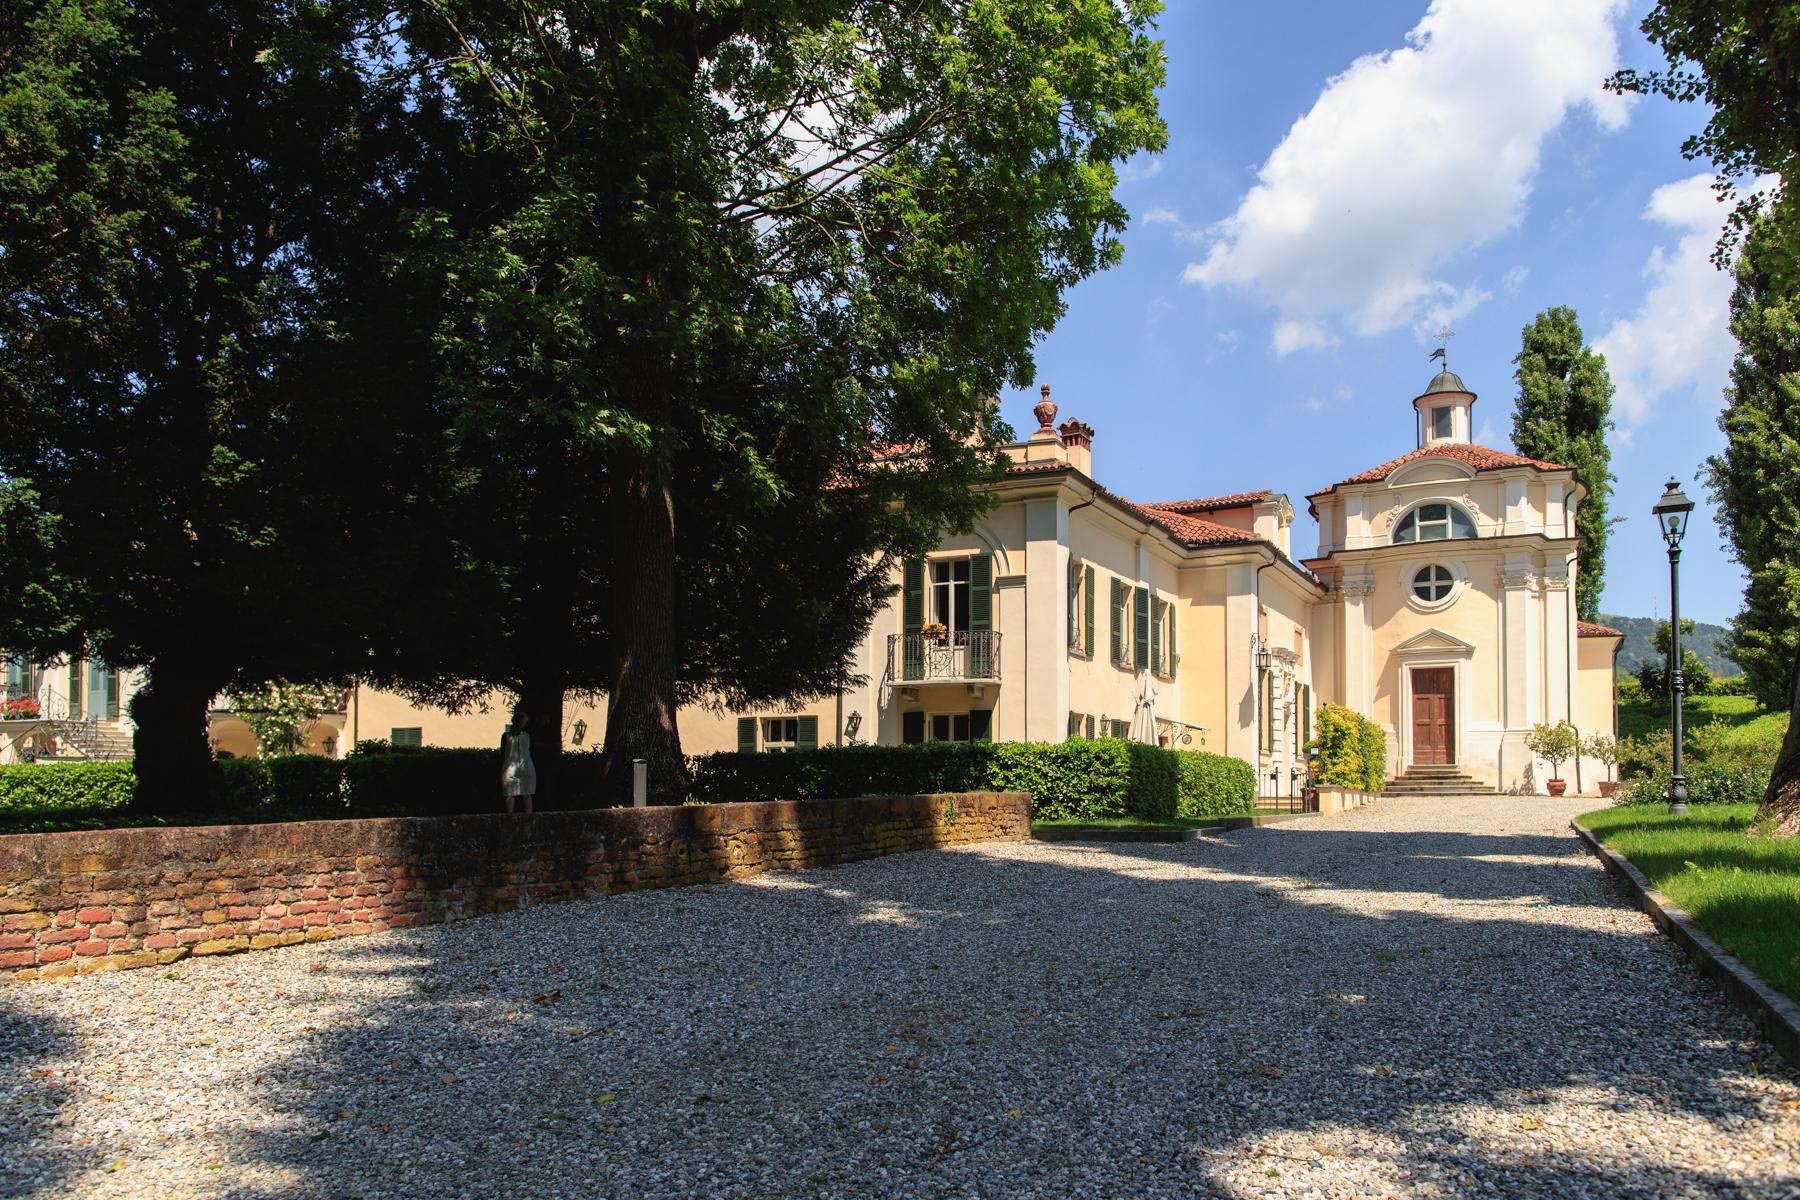 Apartamento por un Venta en Elegant apartment in a 18th century villa Strada San Michele Moncalieri, Turin 10024 Italia